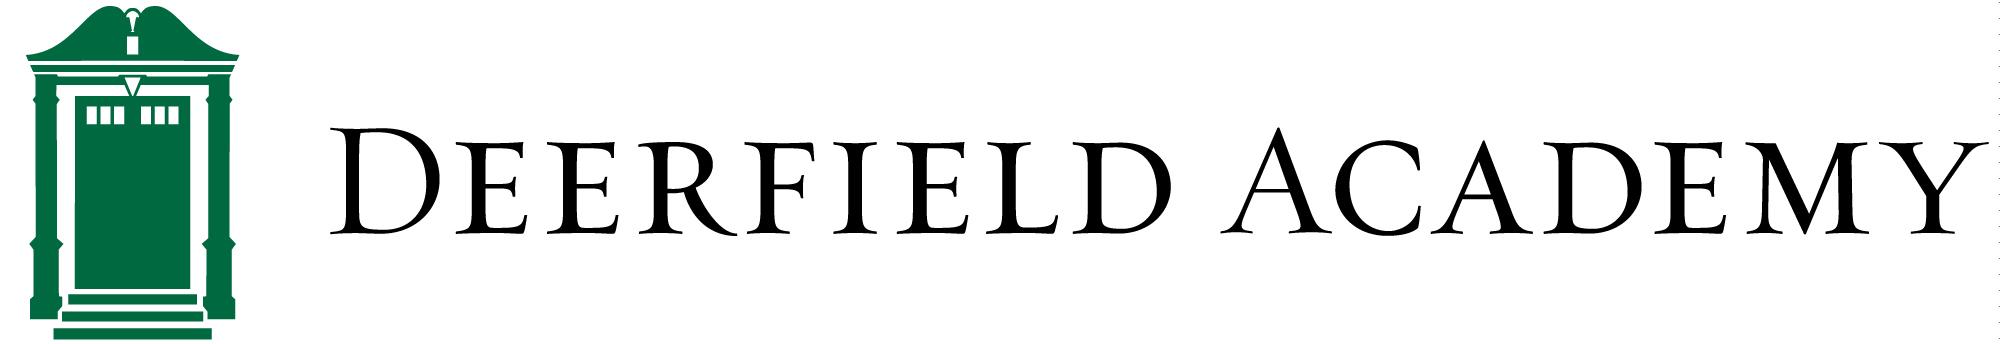 Deerfield_Academy_Lakhani_Coaching_Acceptance_List.jpg